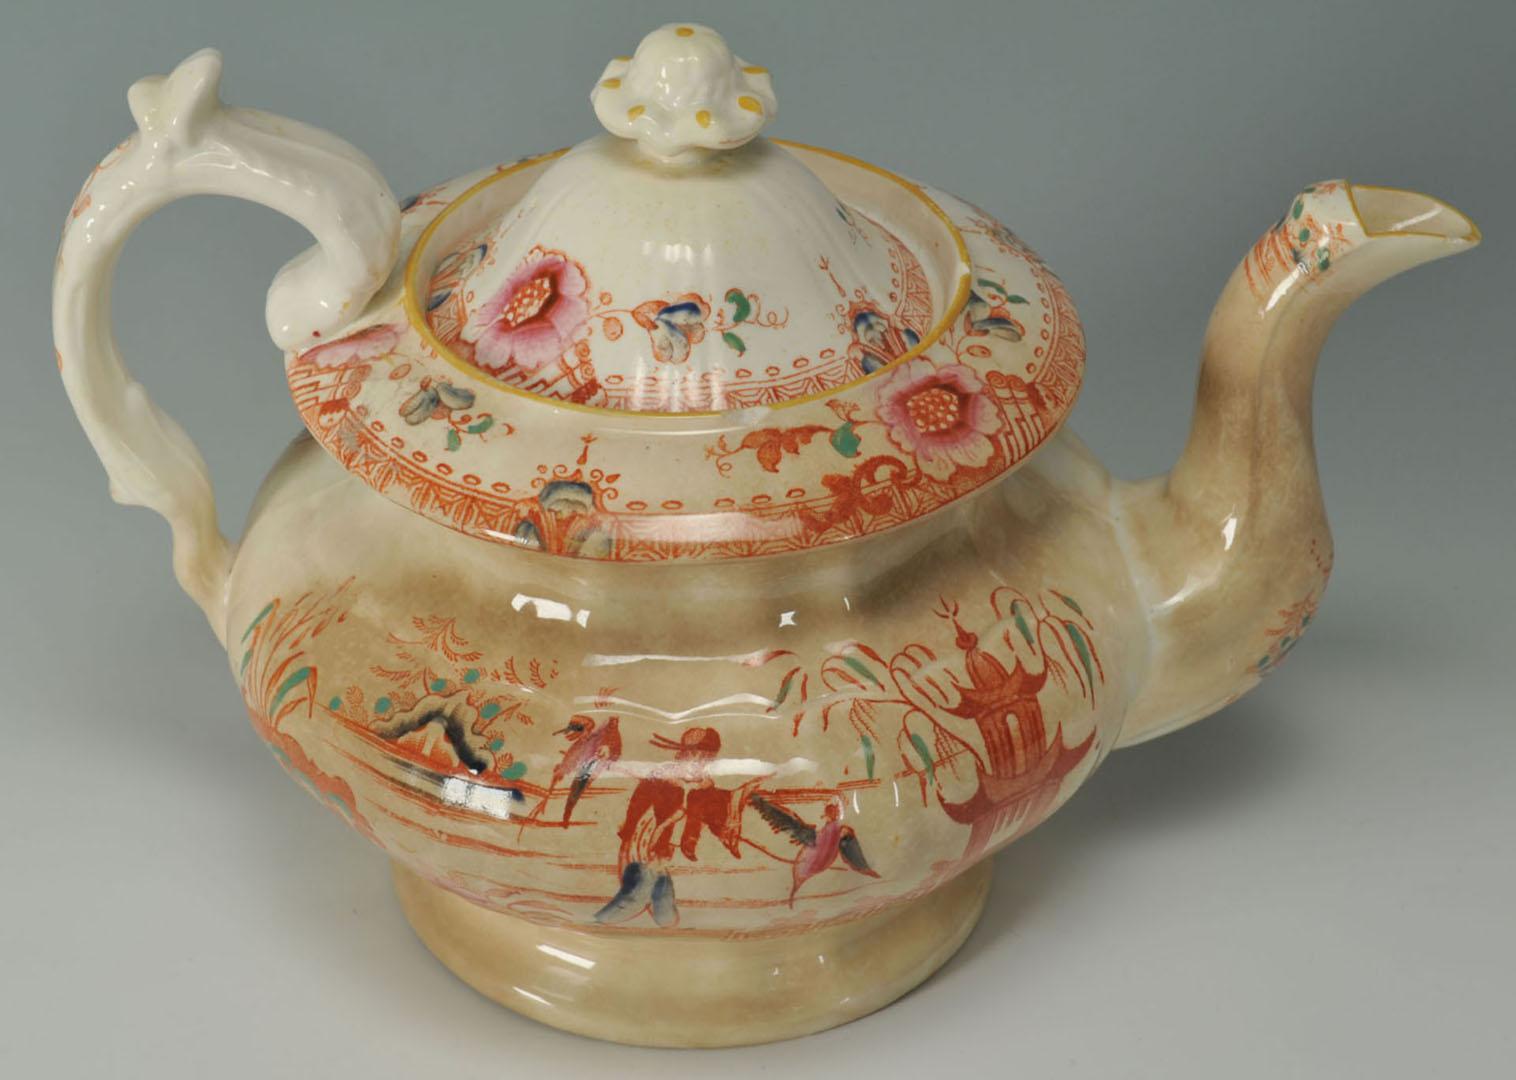 Lot 2872339: 2 English Ceramic Items w/ Asian Themes